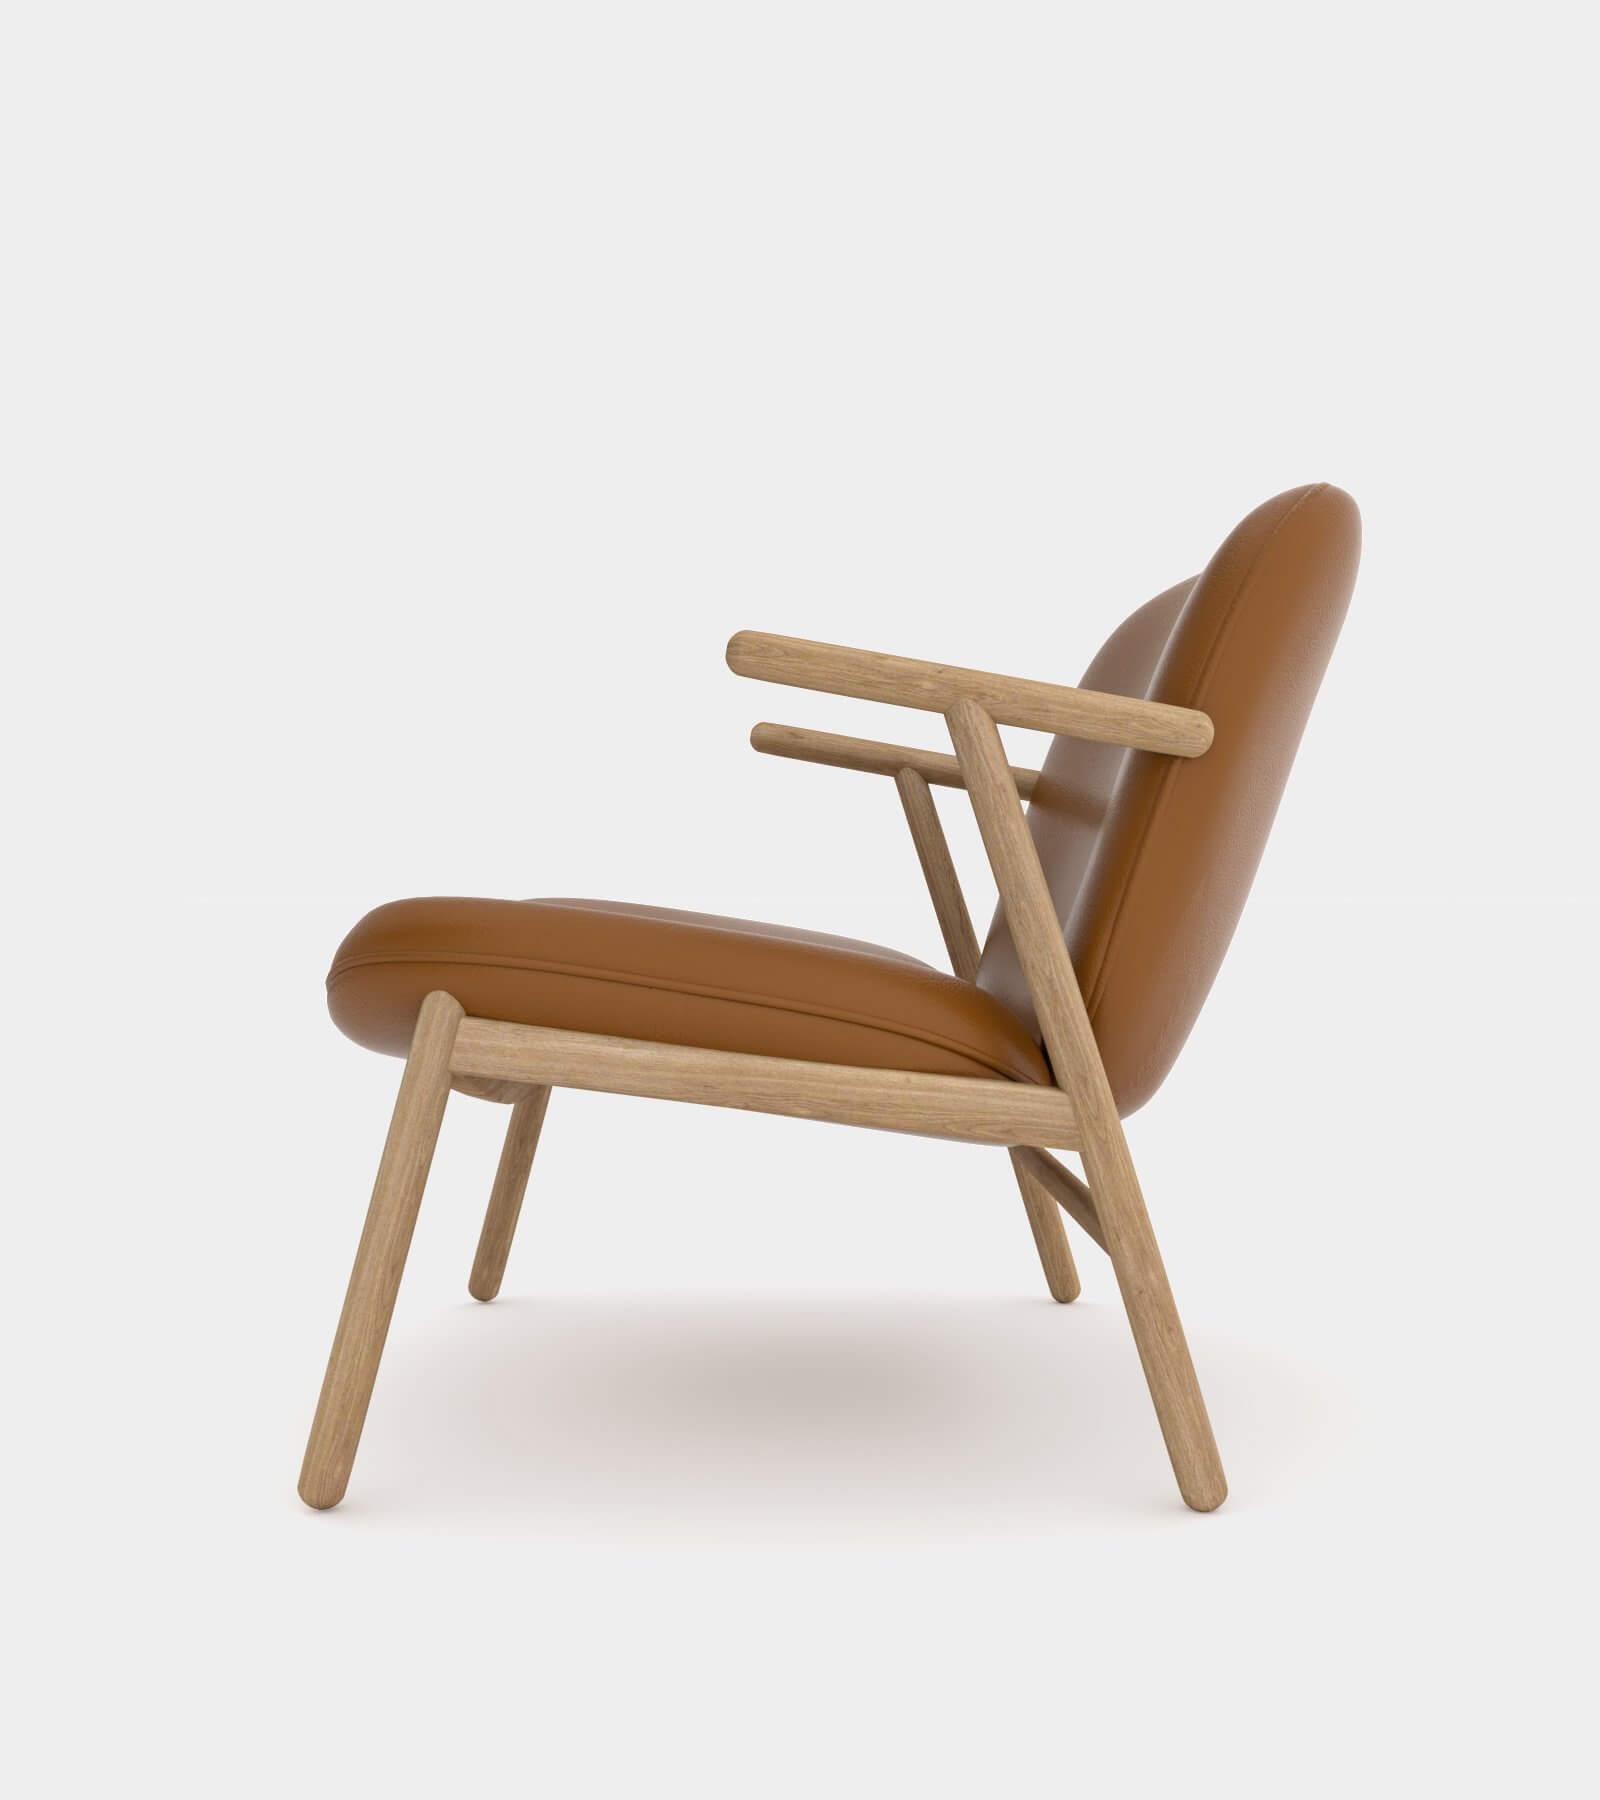 Cozy lounge chair-3 3D Model